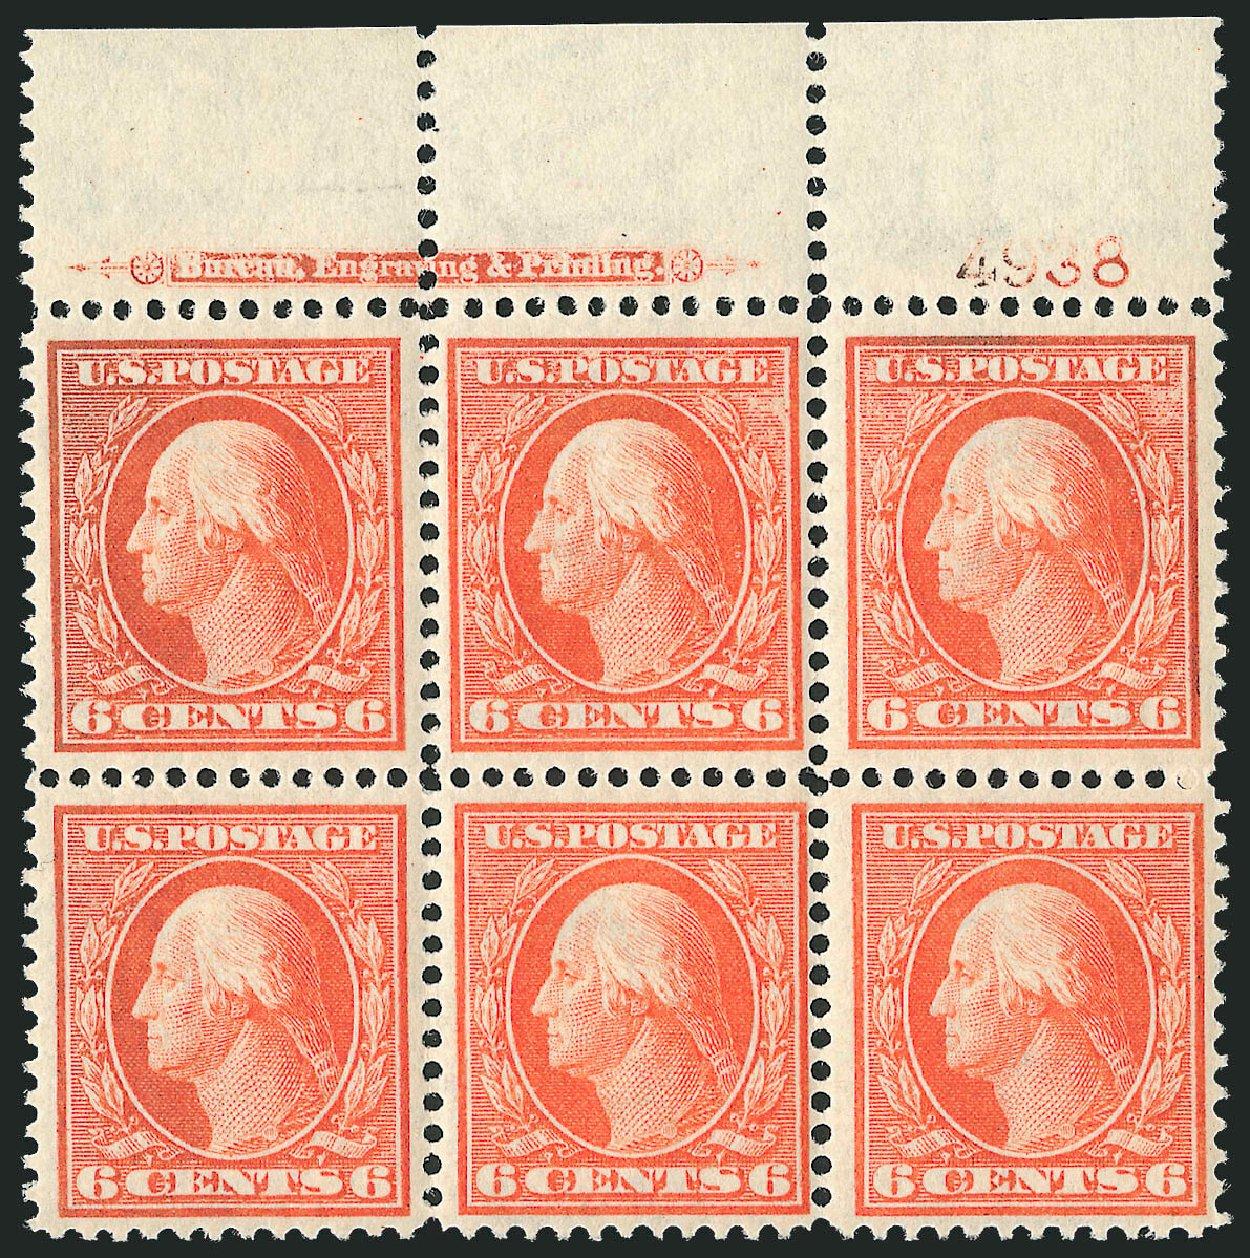 US Stamps Values Scott Catalog #336: 6c 1909 Washington. Robert Siegel Auction Galleries, Oct 2010, Sale 997, Lot 5879